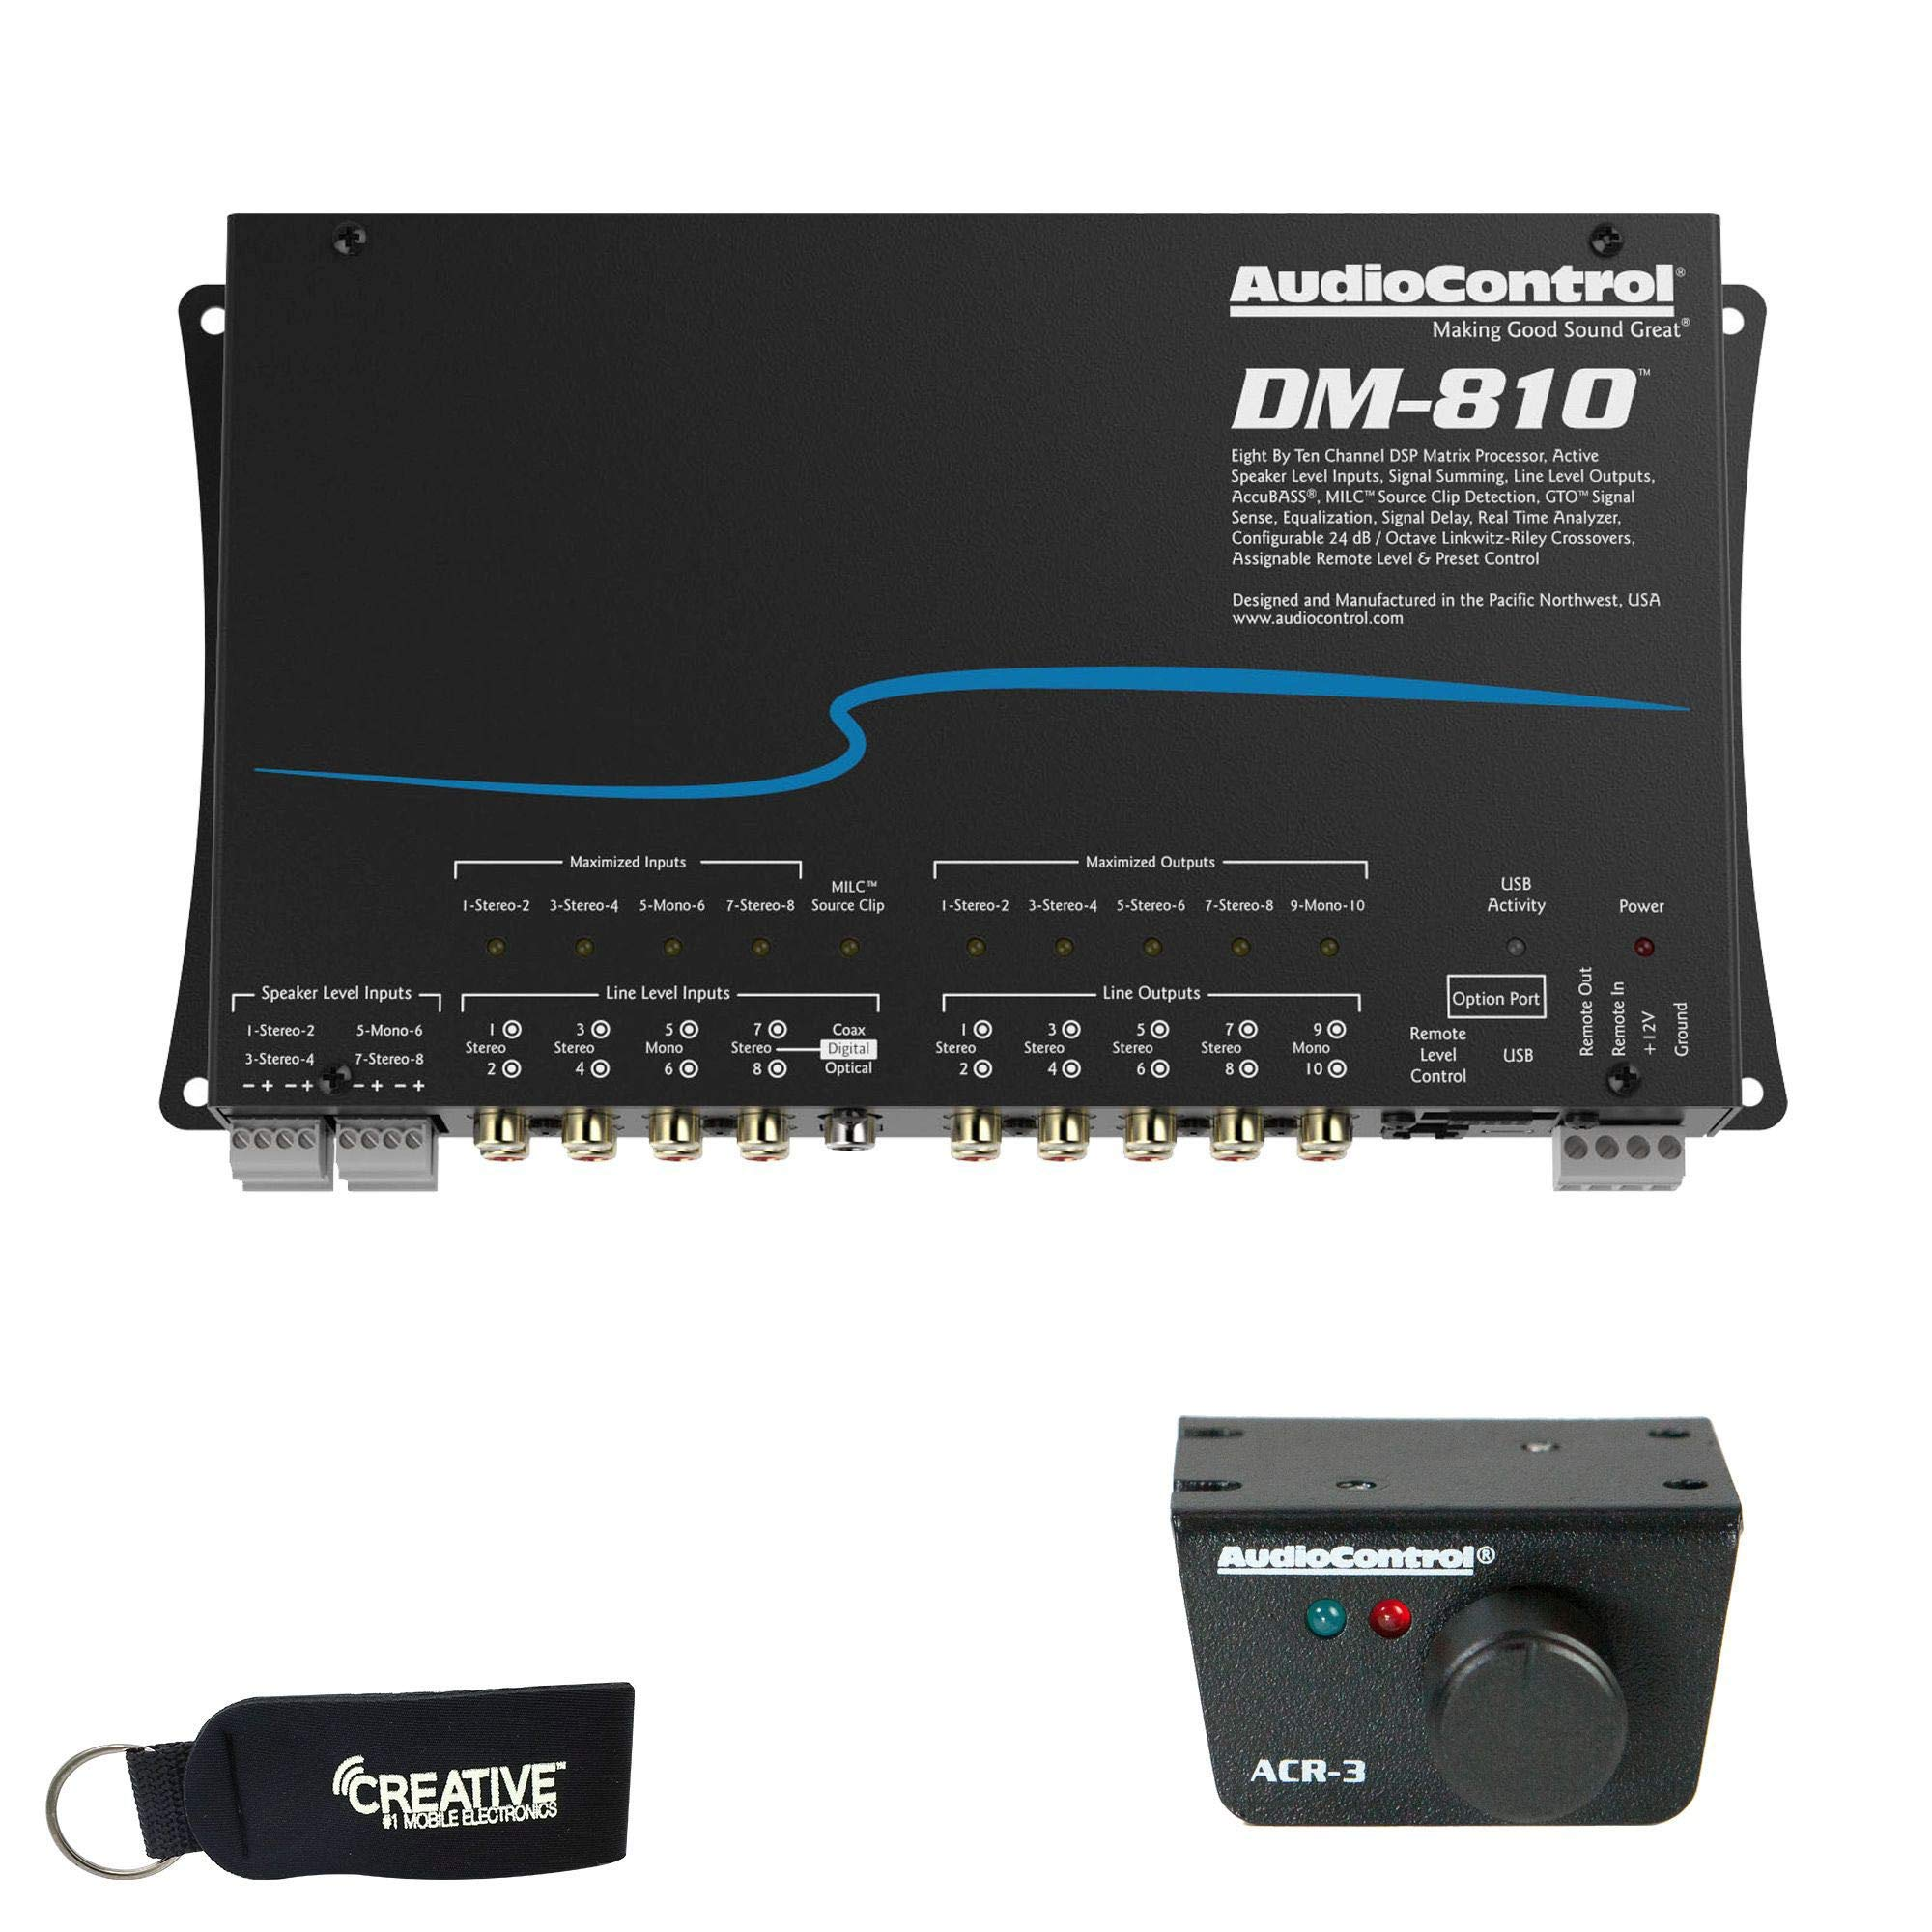 AudioControl DM-810 Premium 8 Input 10 Output DSP Matrix Processor, ACR-3 Dash Remote